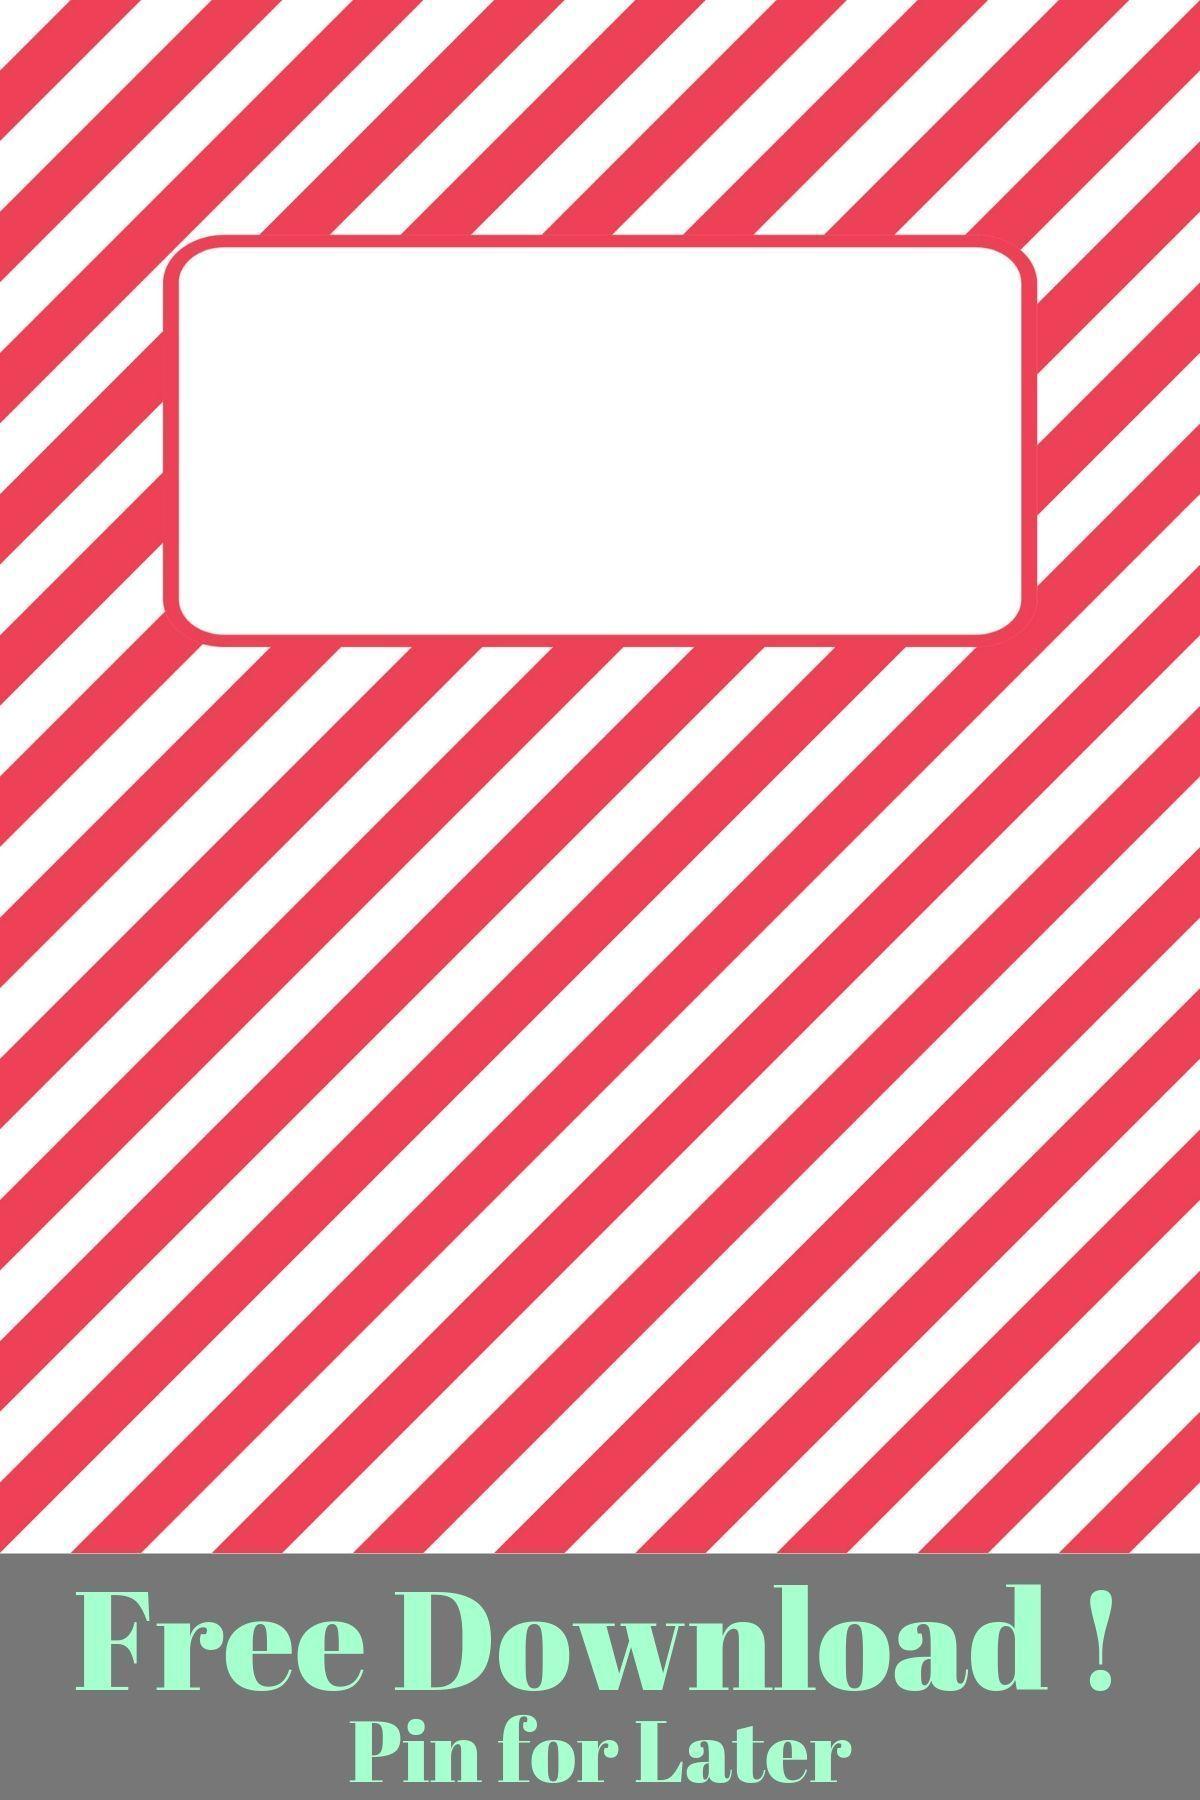 graphic regarding Recipe Binder Cover Printable titled 41 Totally free Printable Binder Handles Printables Binder handles